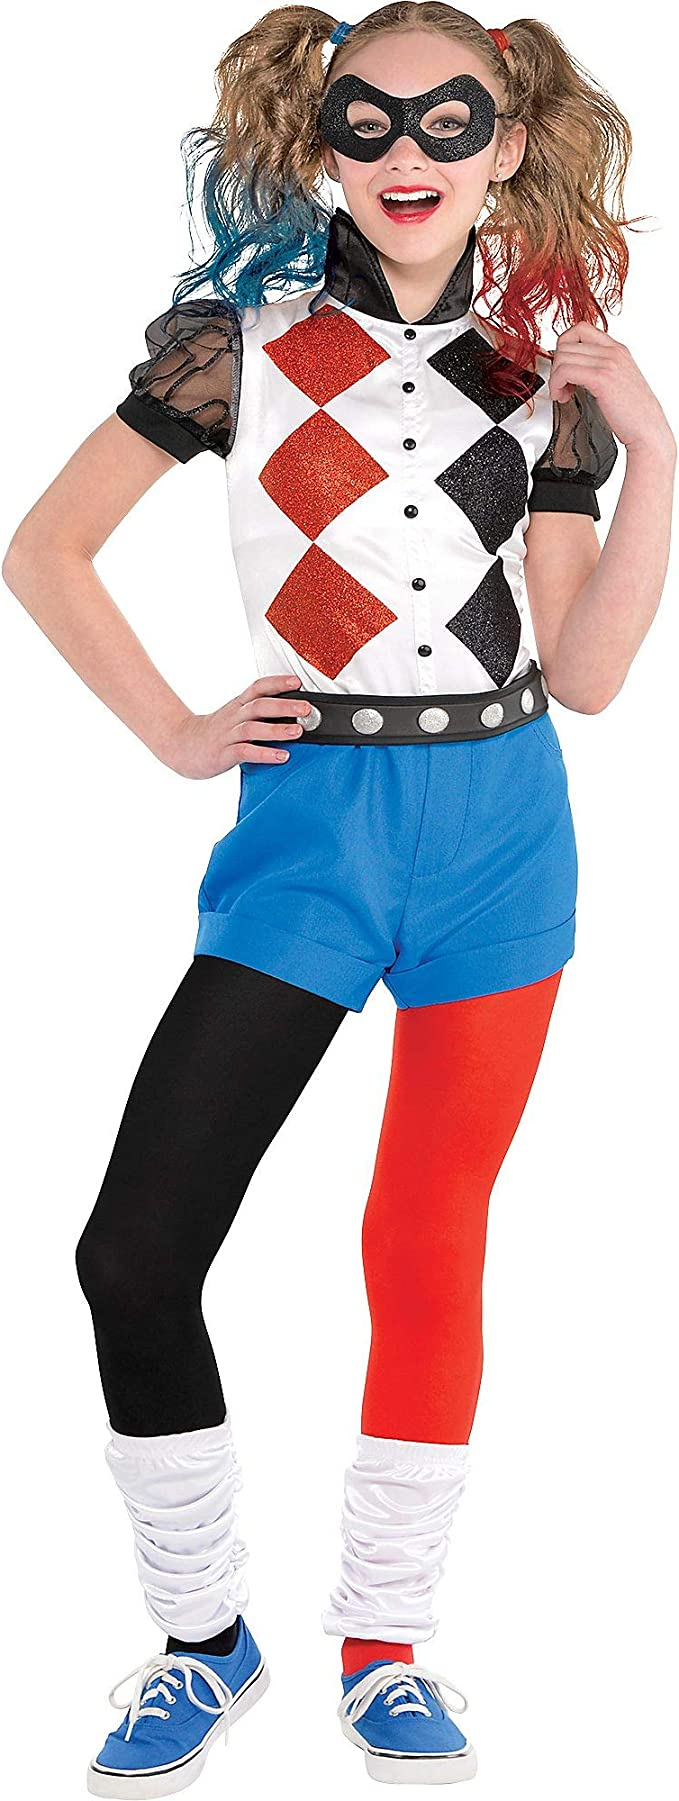 Amazon.com: Costumes USA DC Super Hero - Disfraz de Harley ...